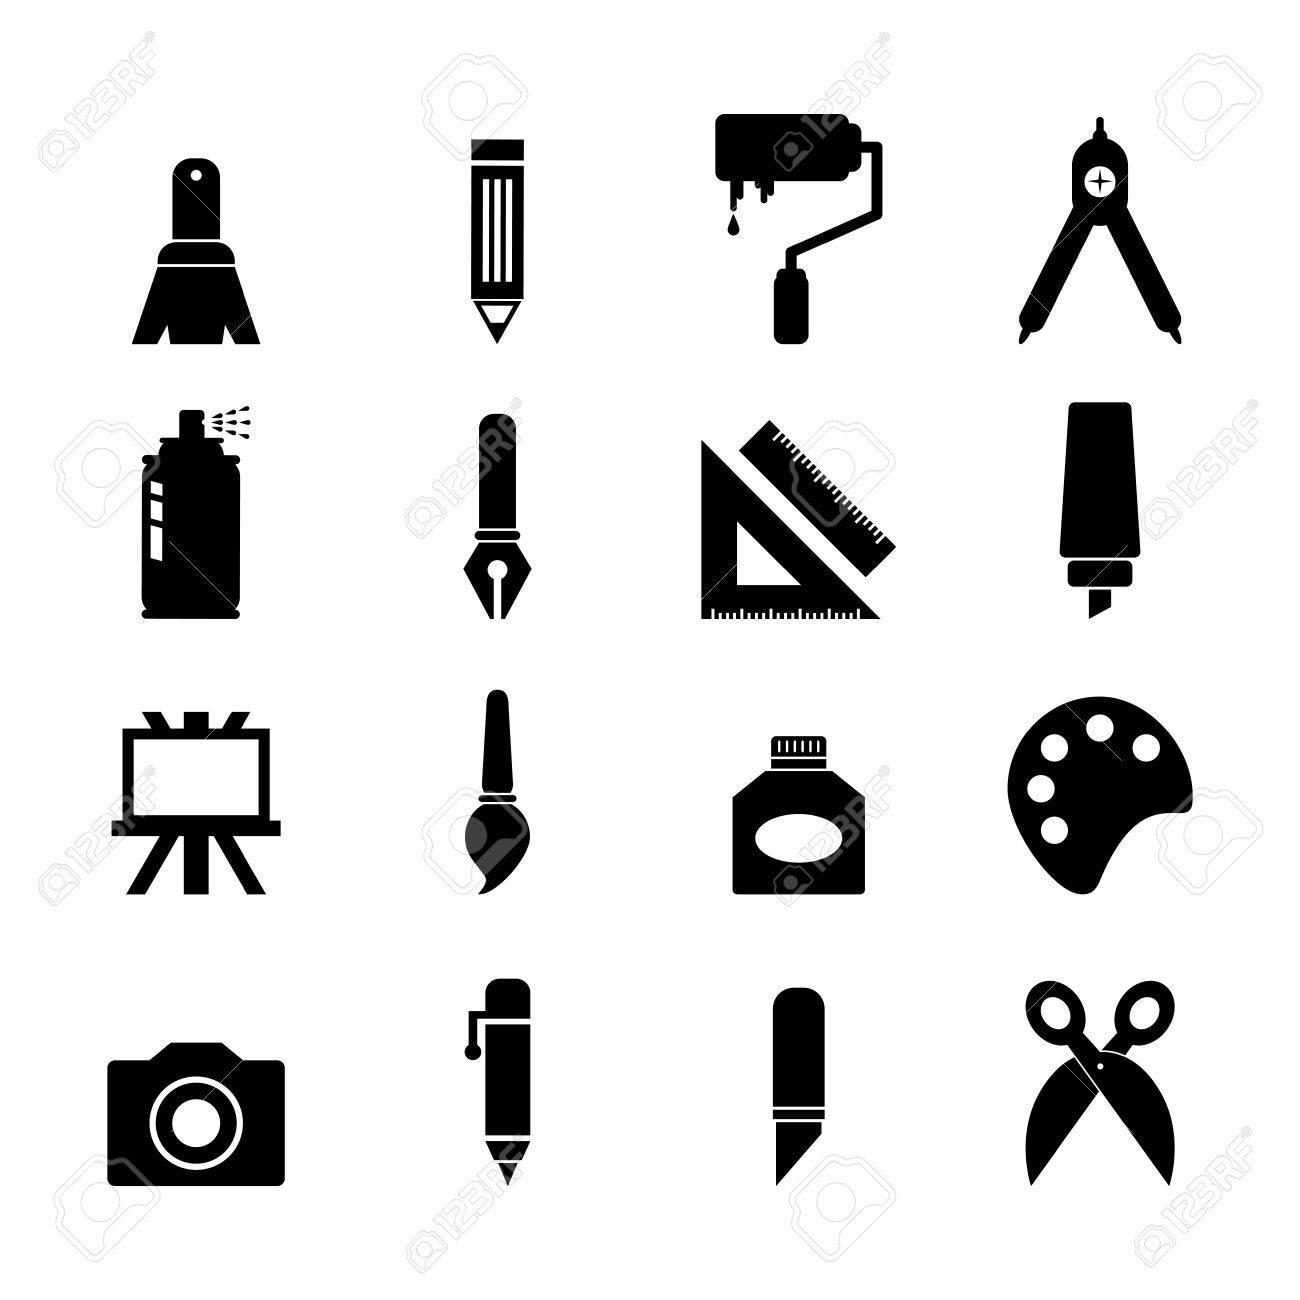 tool icon vector. art tool icon stock vector 30456256